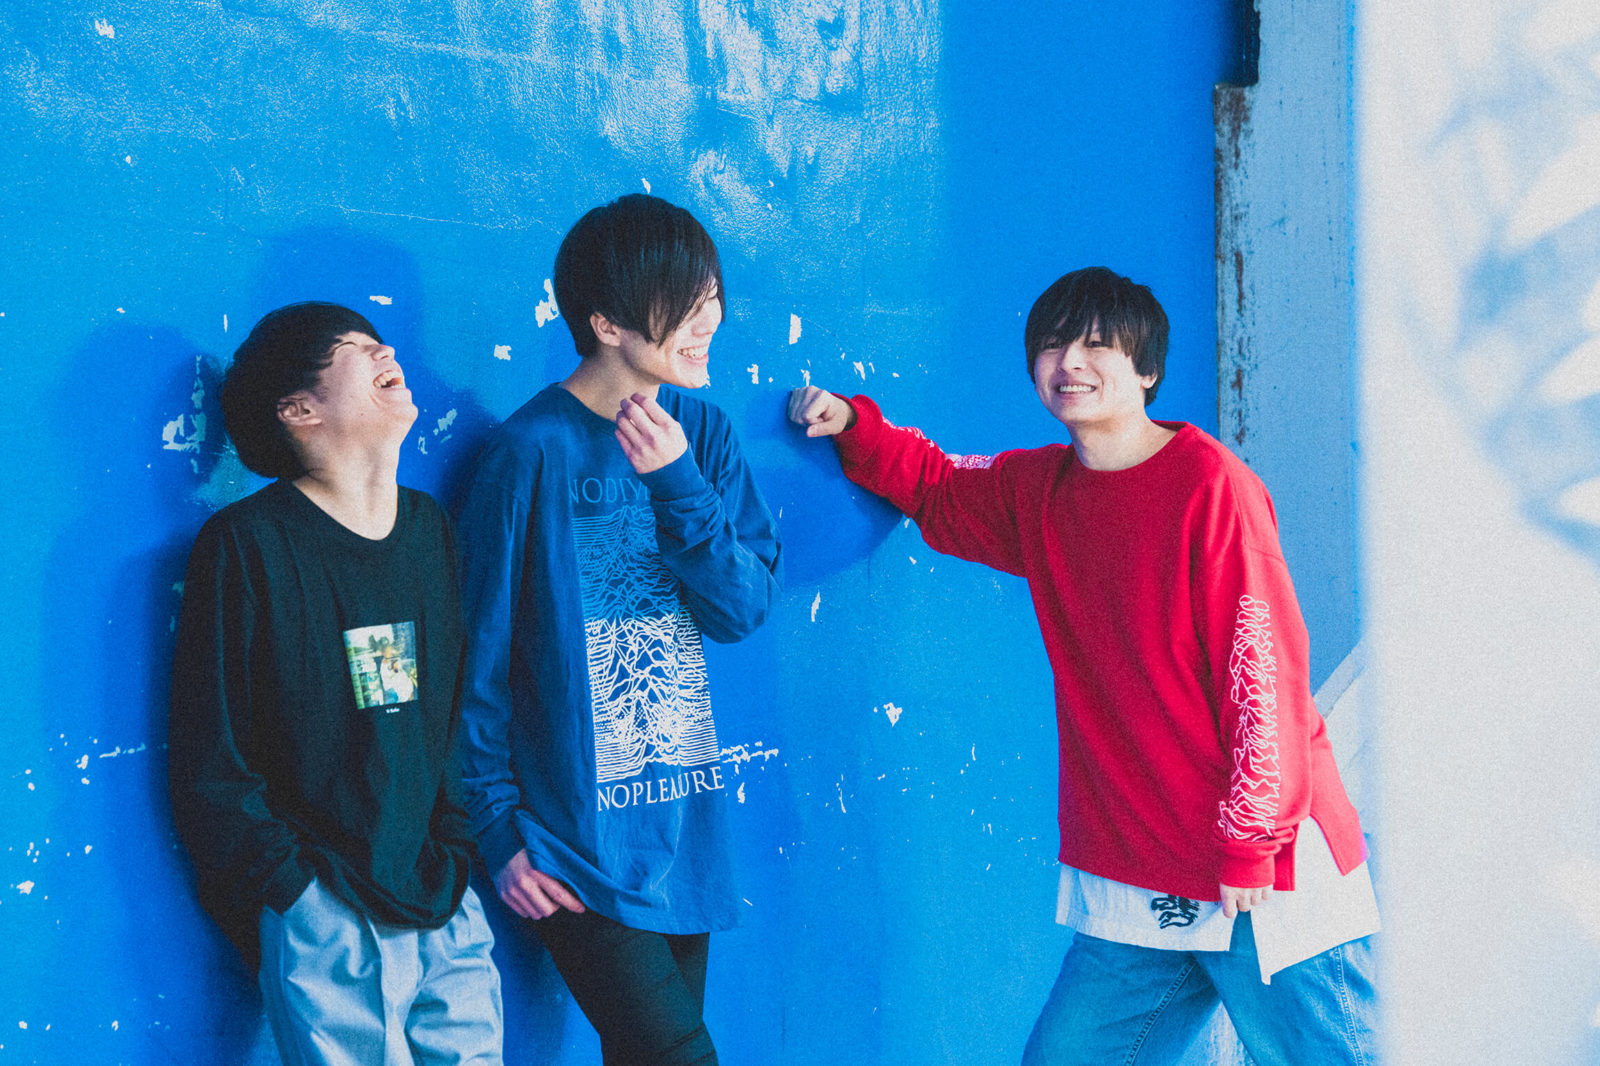 Plot Scraps、待望の3rd Mini Album『INVOKE』を5月20日にリリース決定サムネイル画像